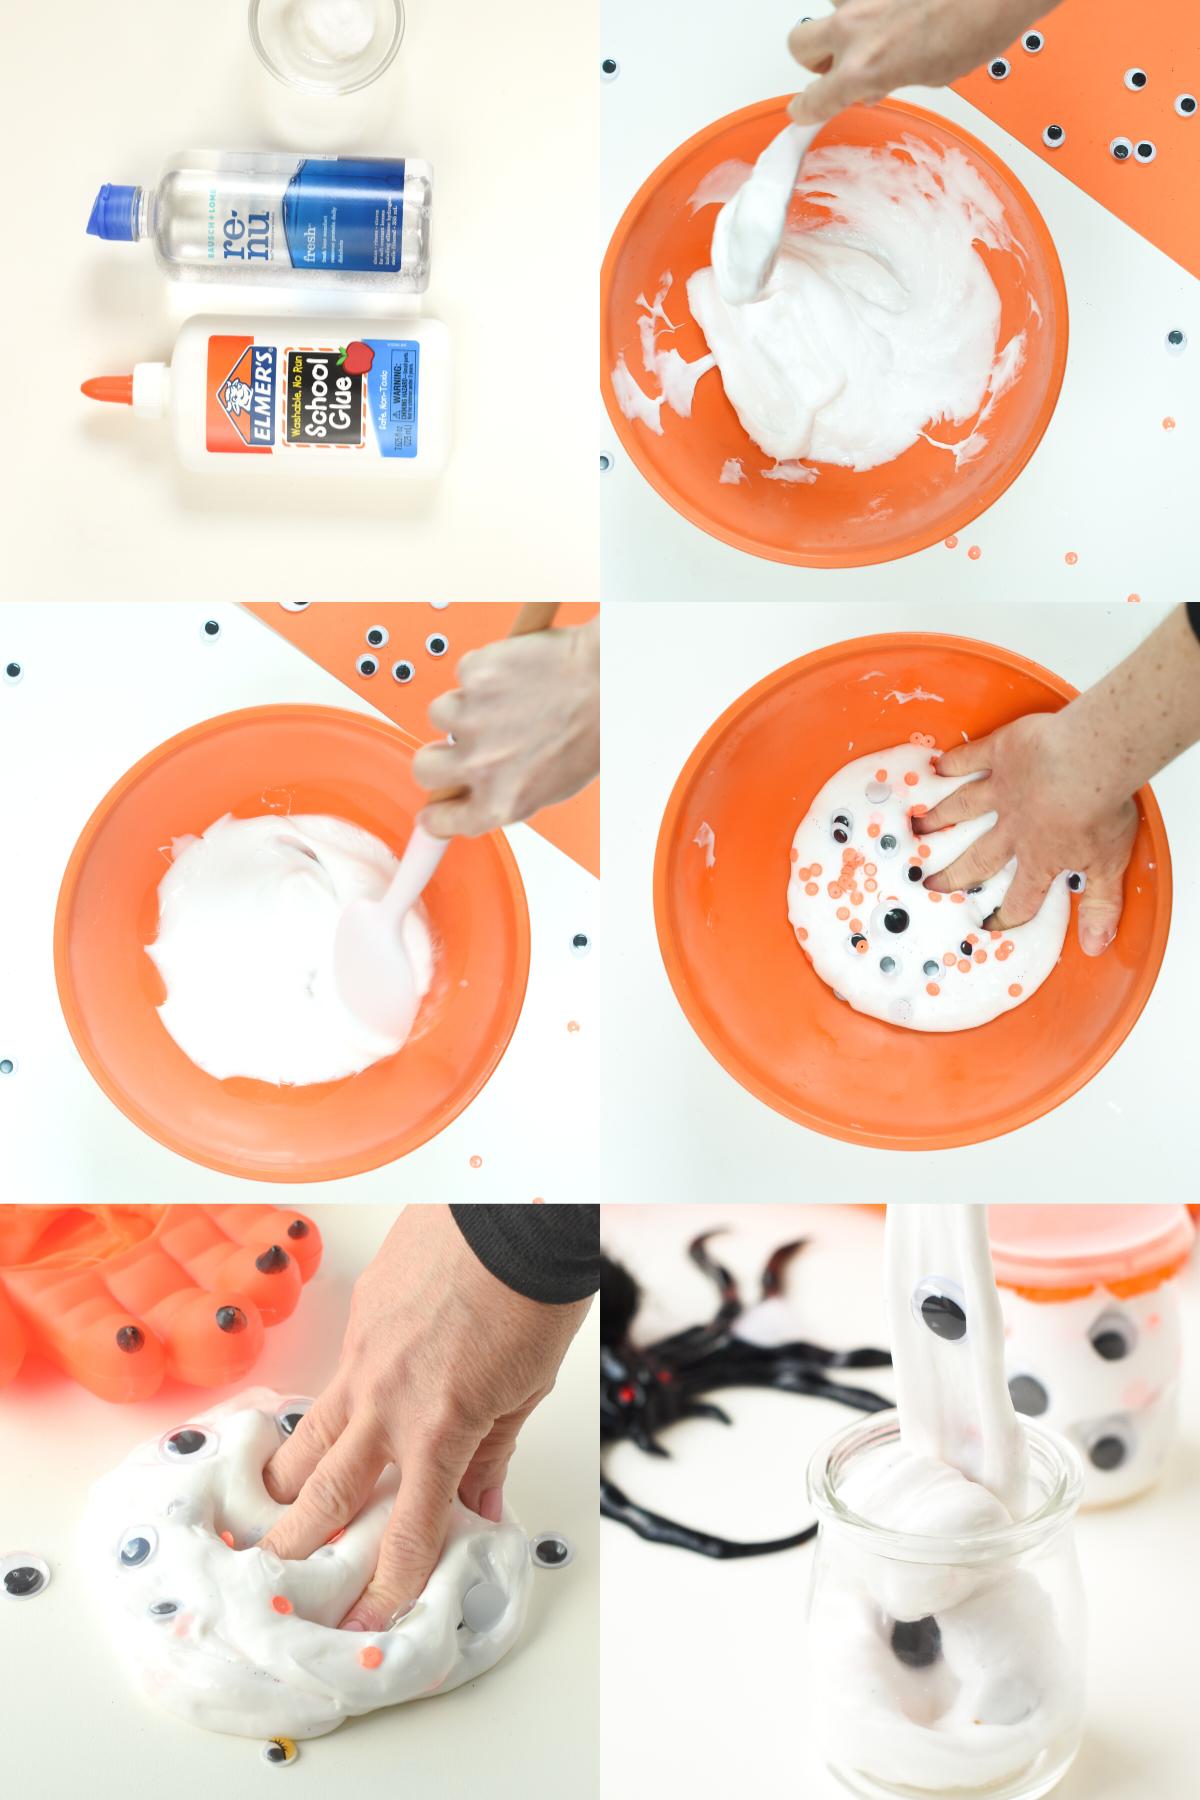 How to make Halloween Slime RecipeHow to make Halloween Slime Recipe